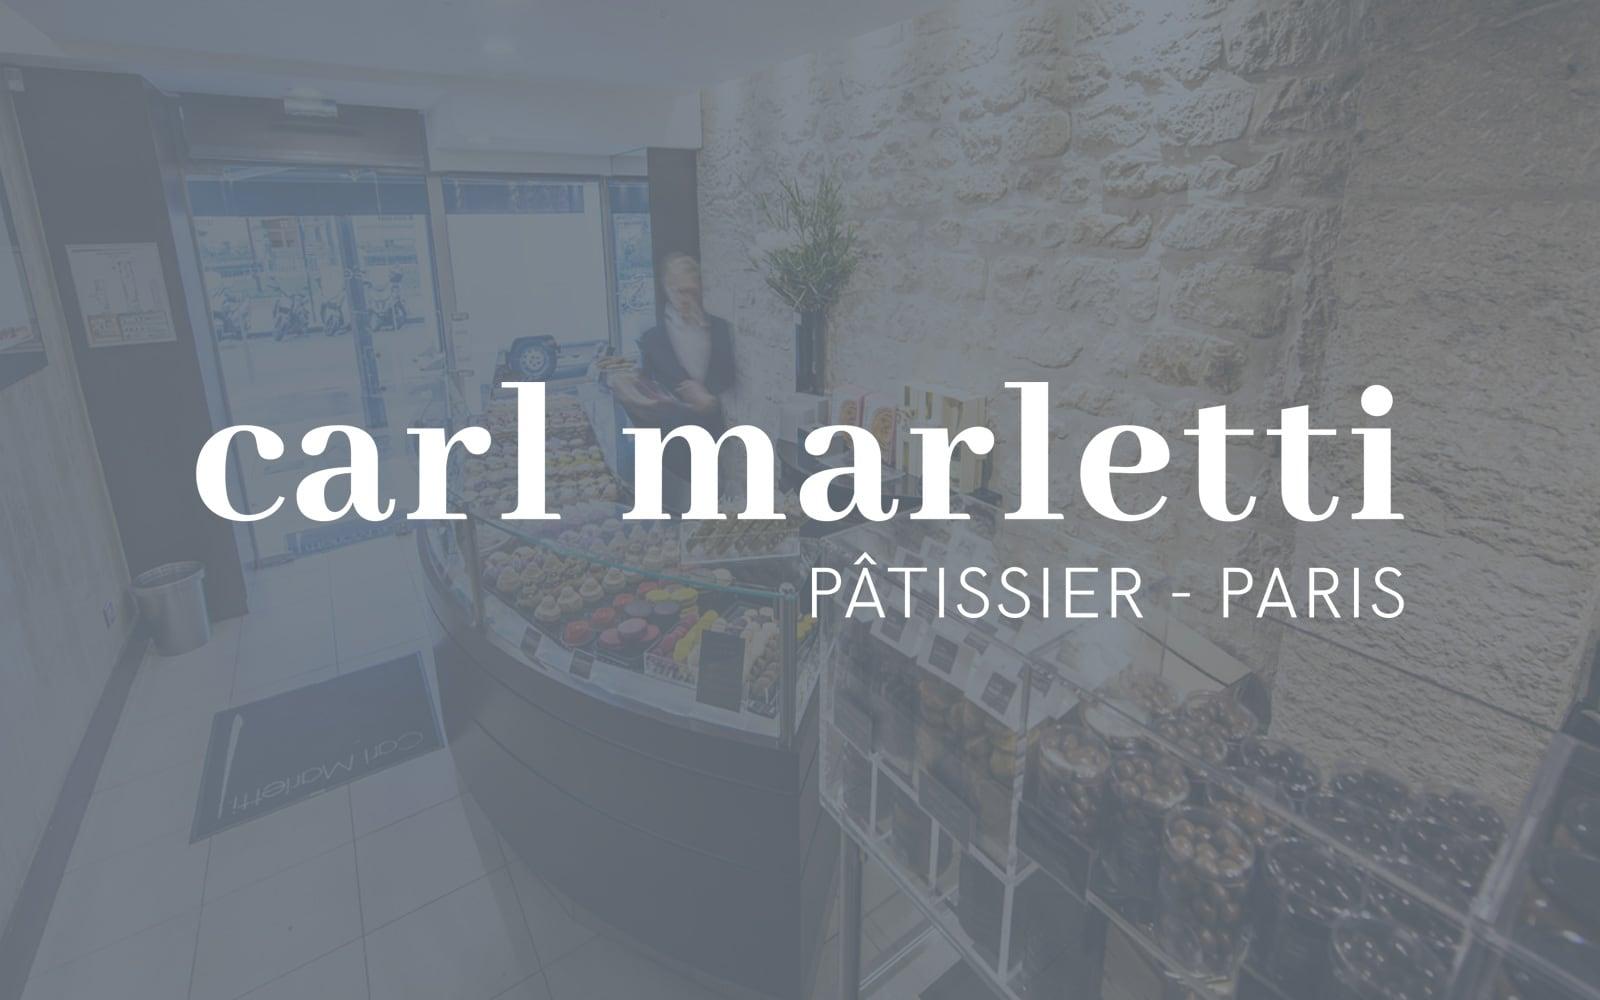 (c) Carlmarletti.com